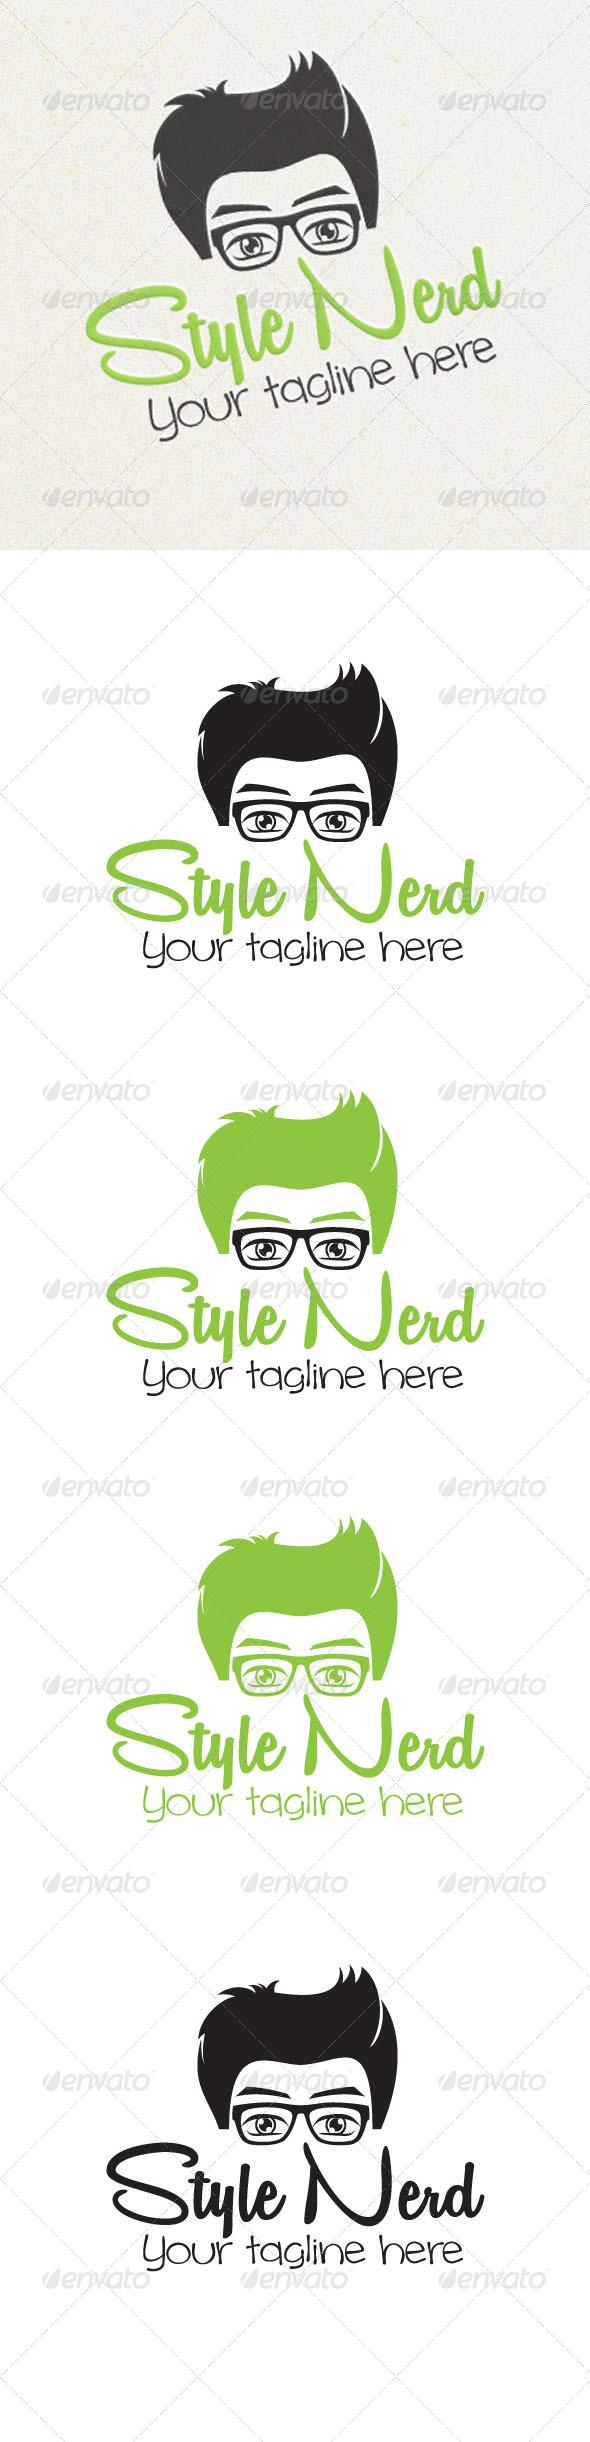 GraphicRiver Style Nerd 4852445